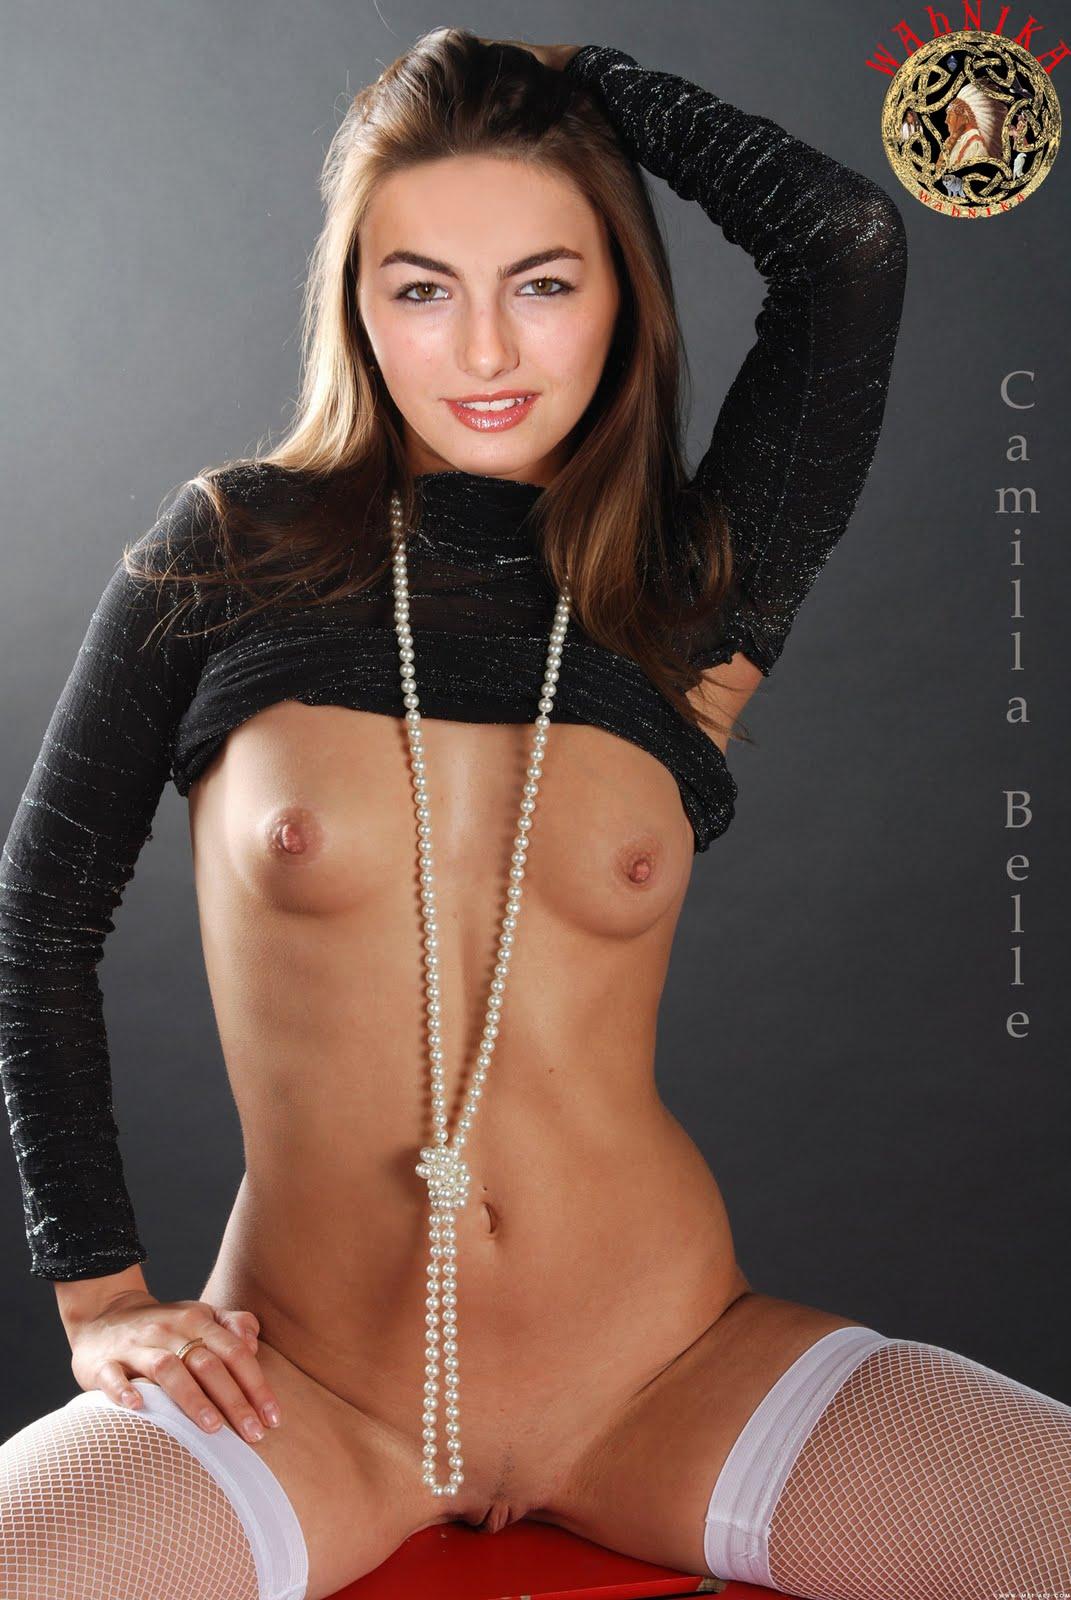 Таня хансен порно 13 фотография